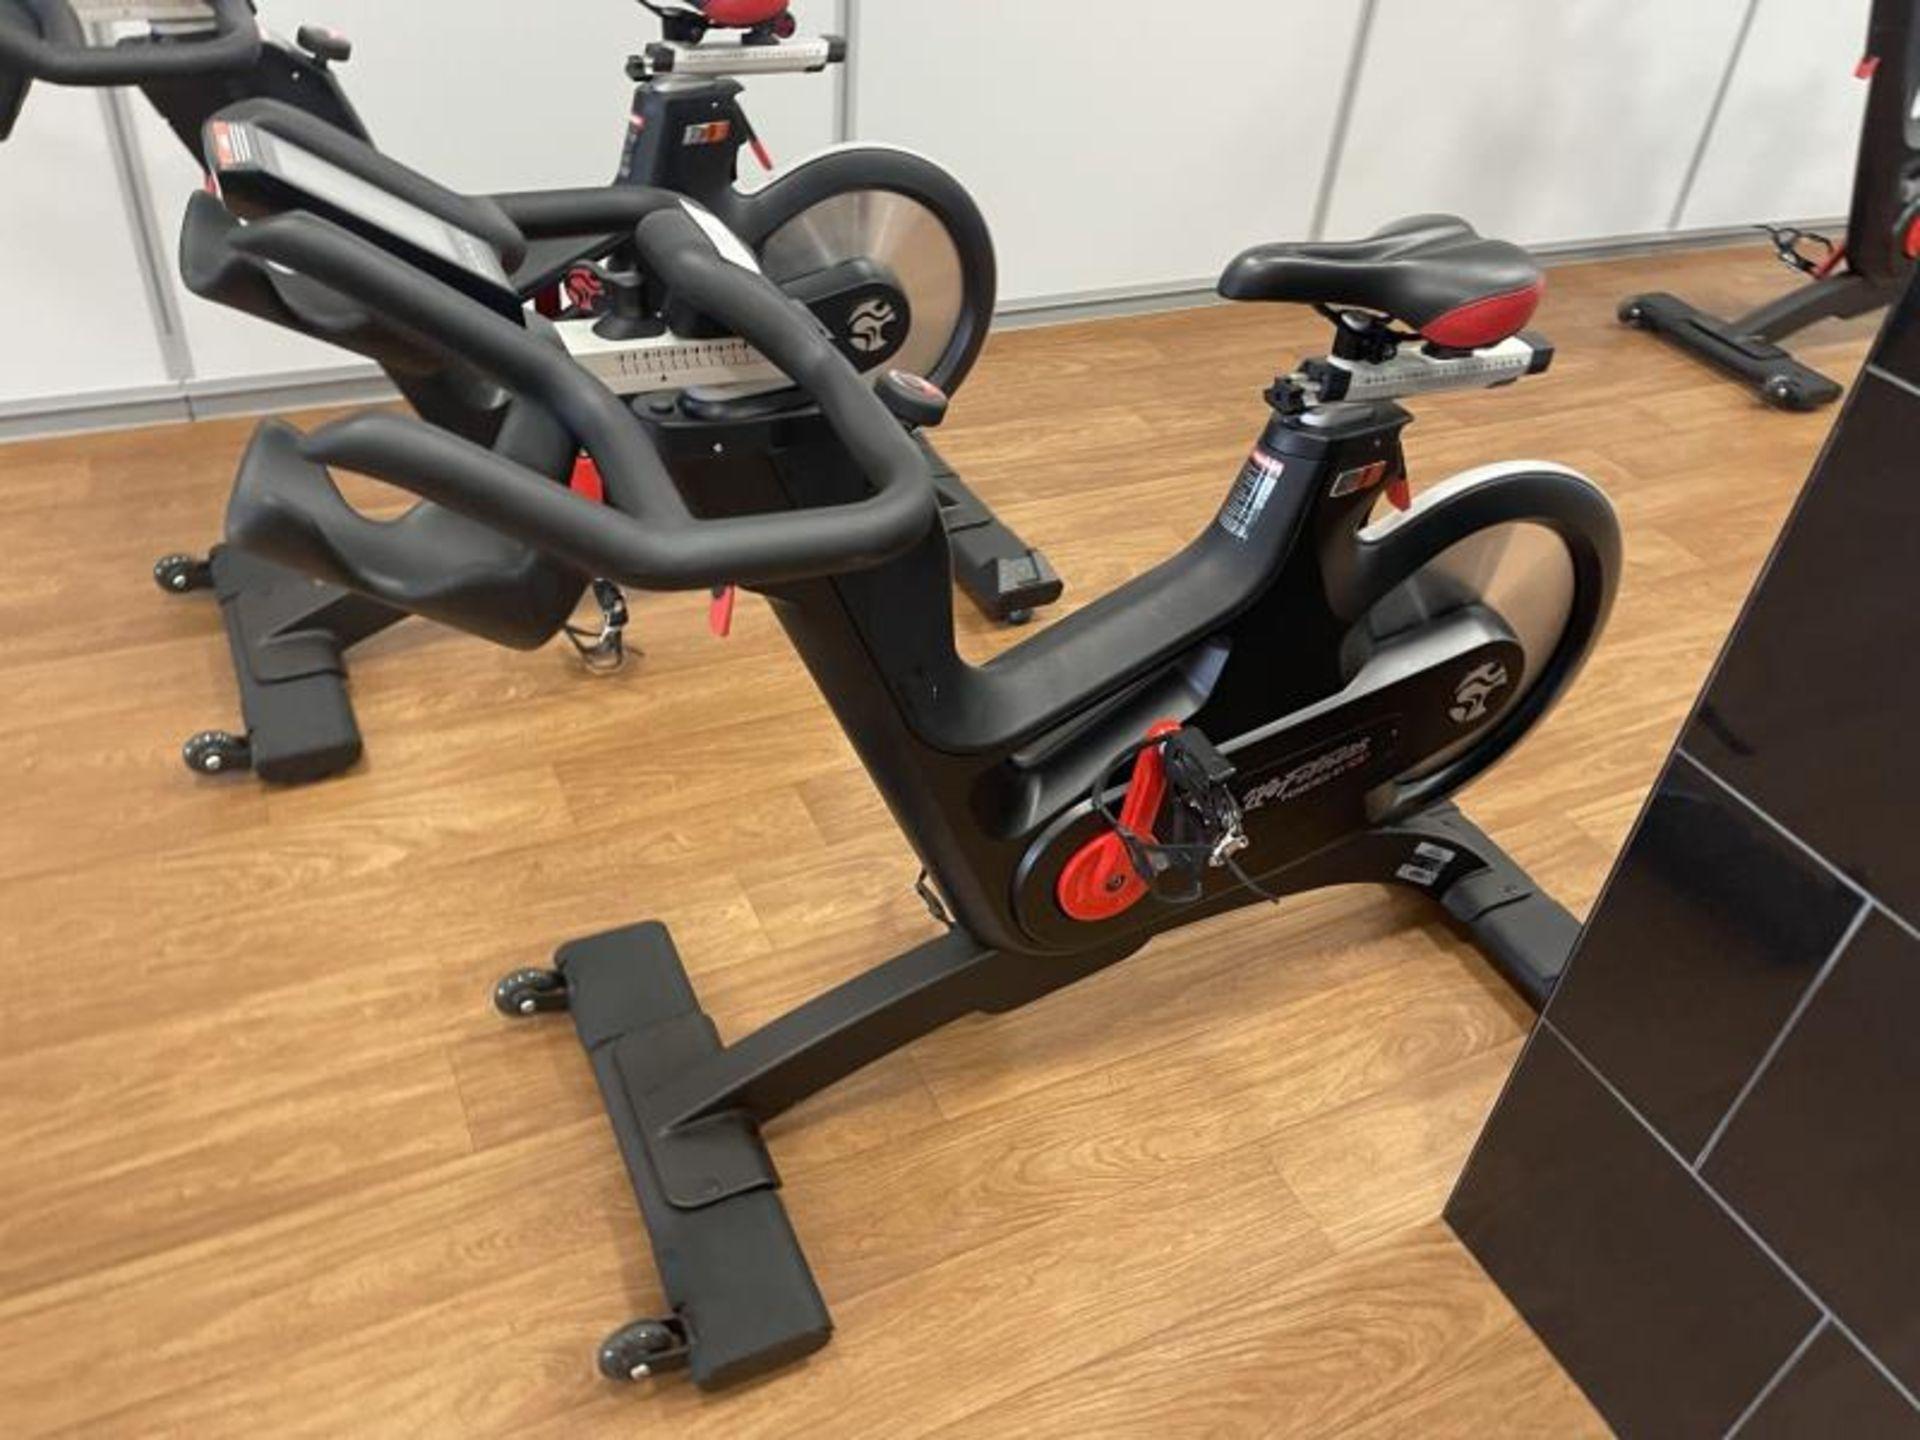 2028 Life Fitness IC7 Spin Bike M: IC-LFIC7B2-01 - Image 3 of 3